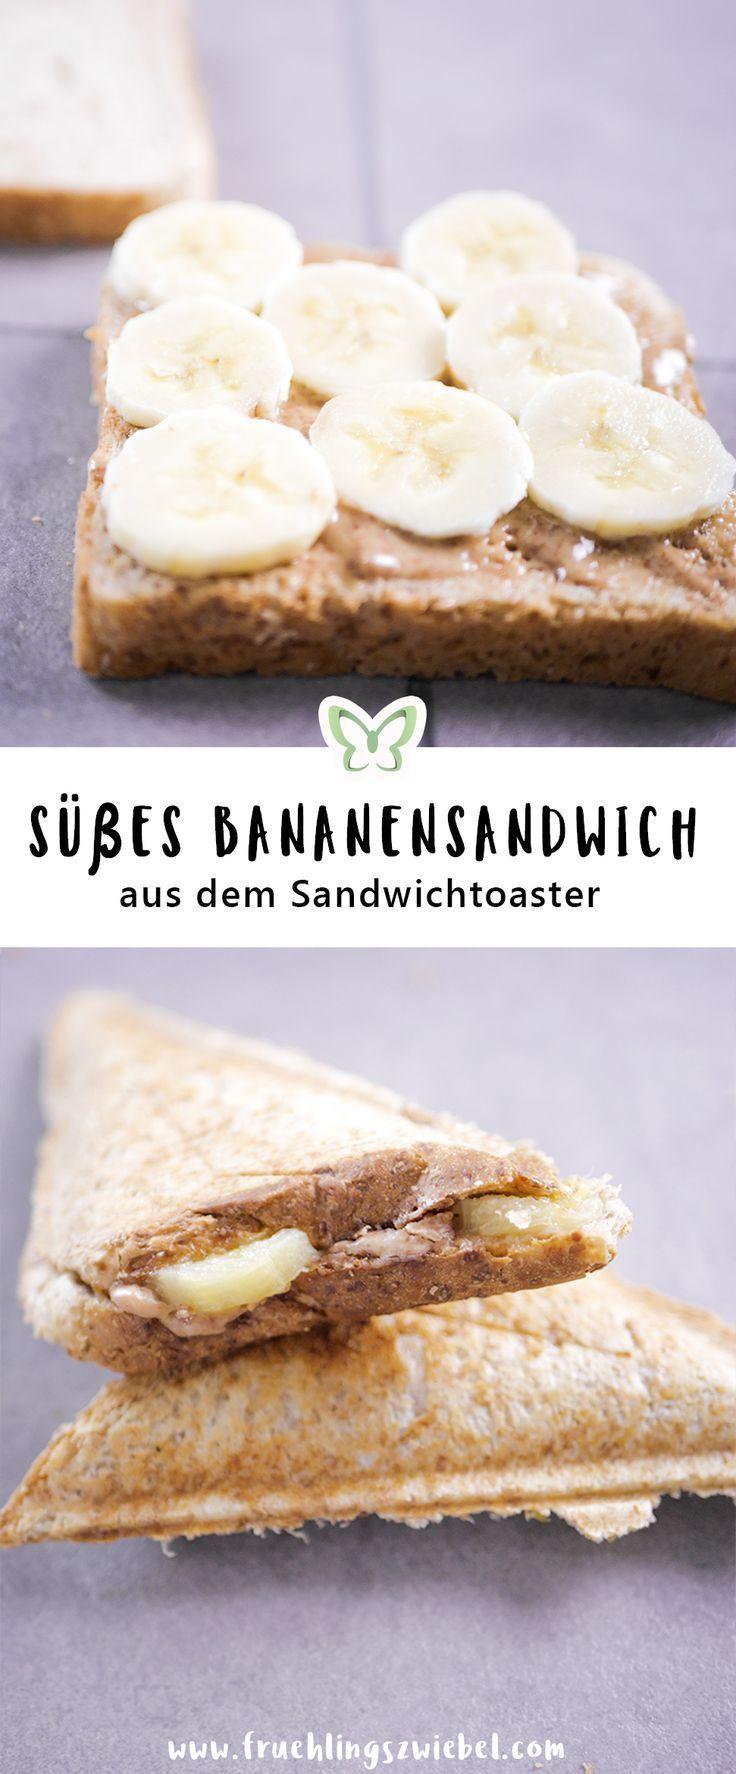 Sandwichmaker Rezepte - 4 gesunde Sandwich Toasts Ideen #peanutrecipes